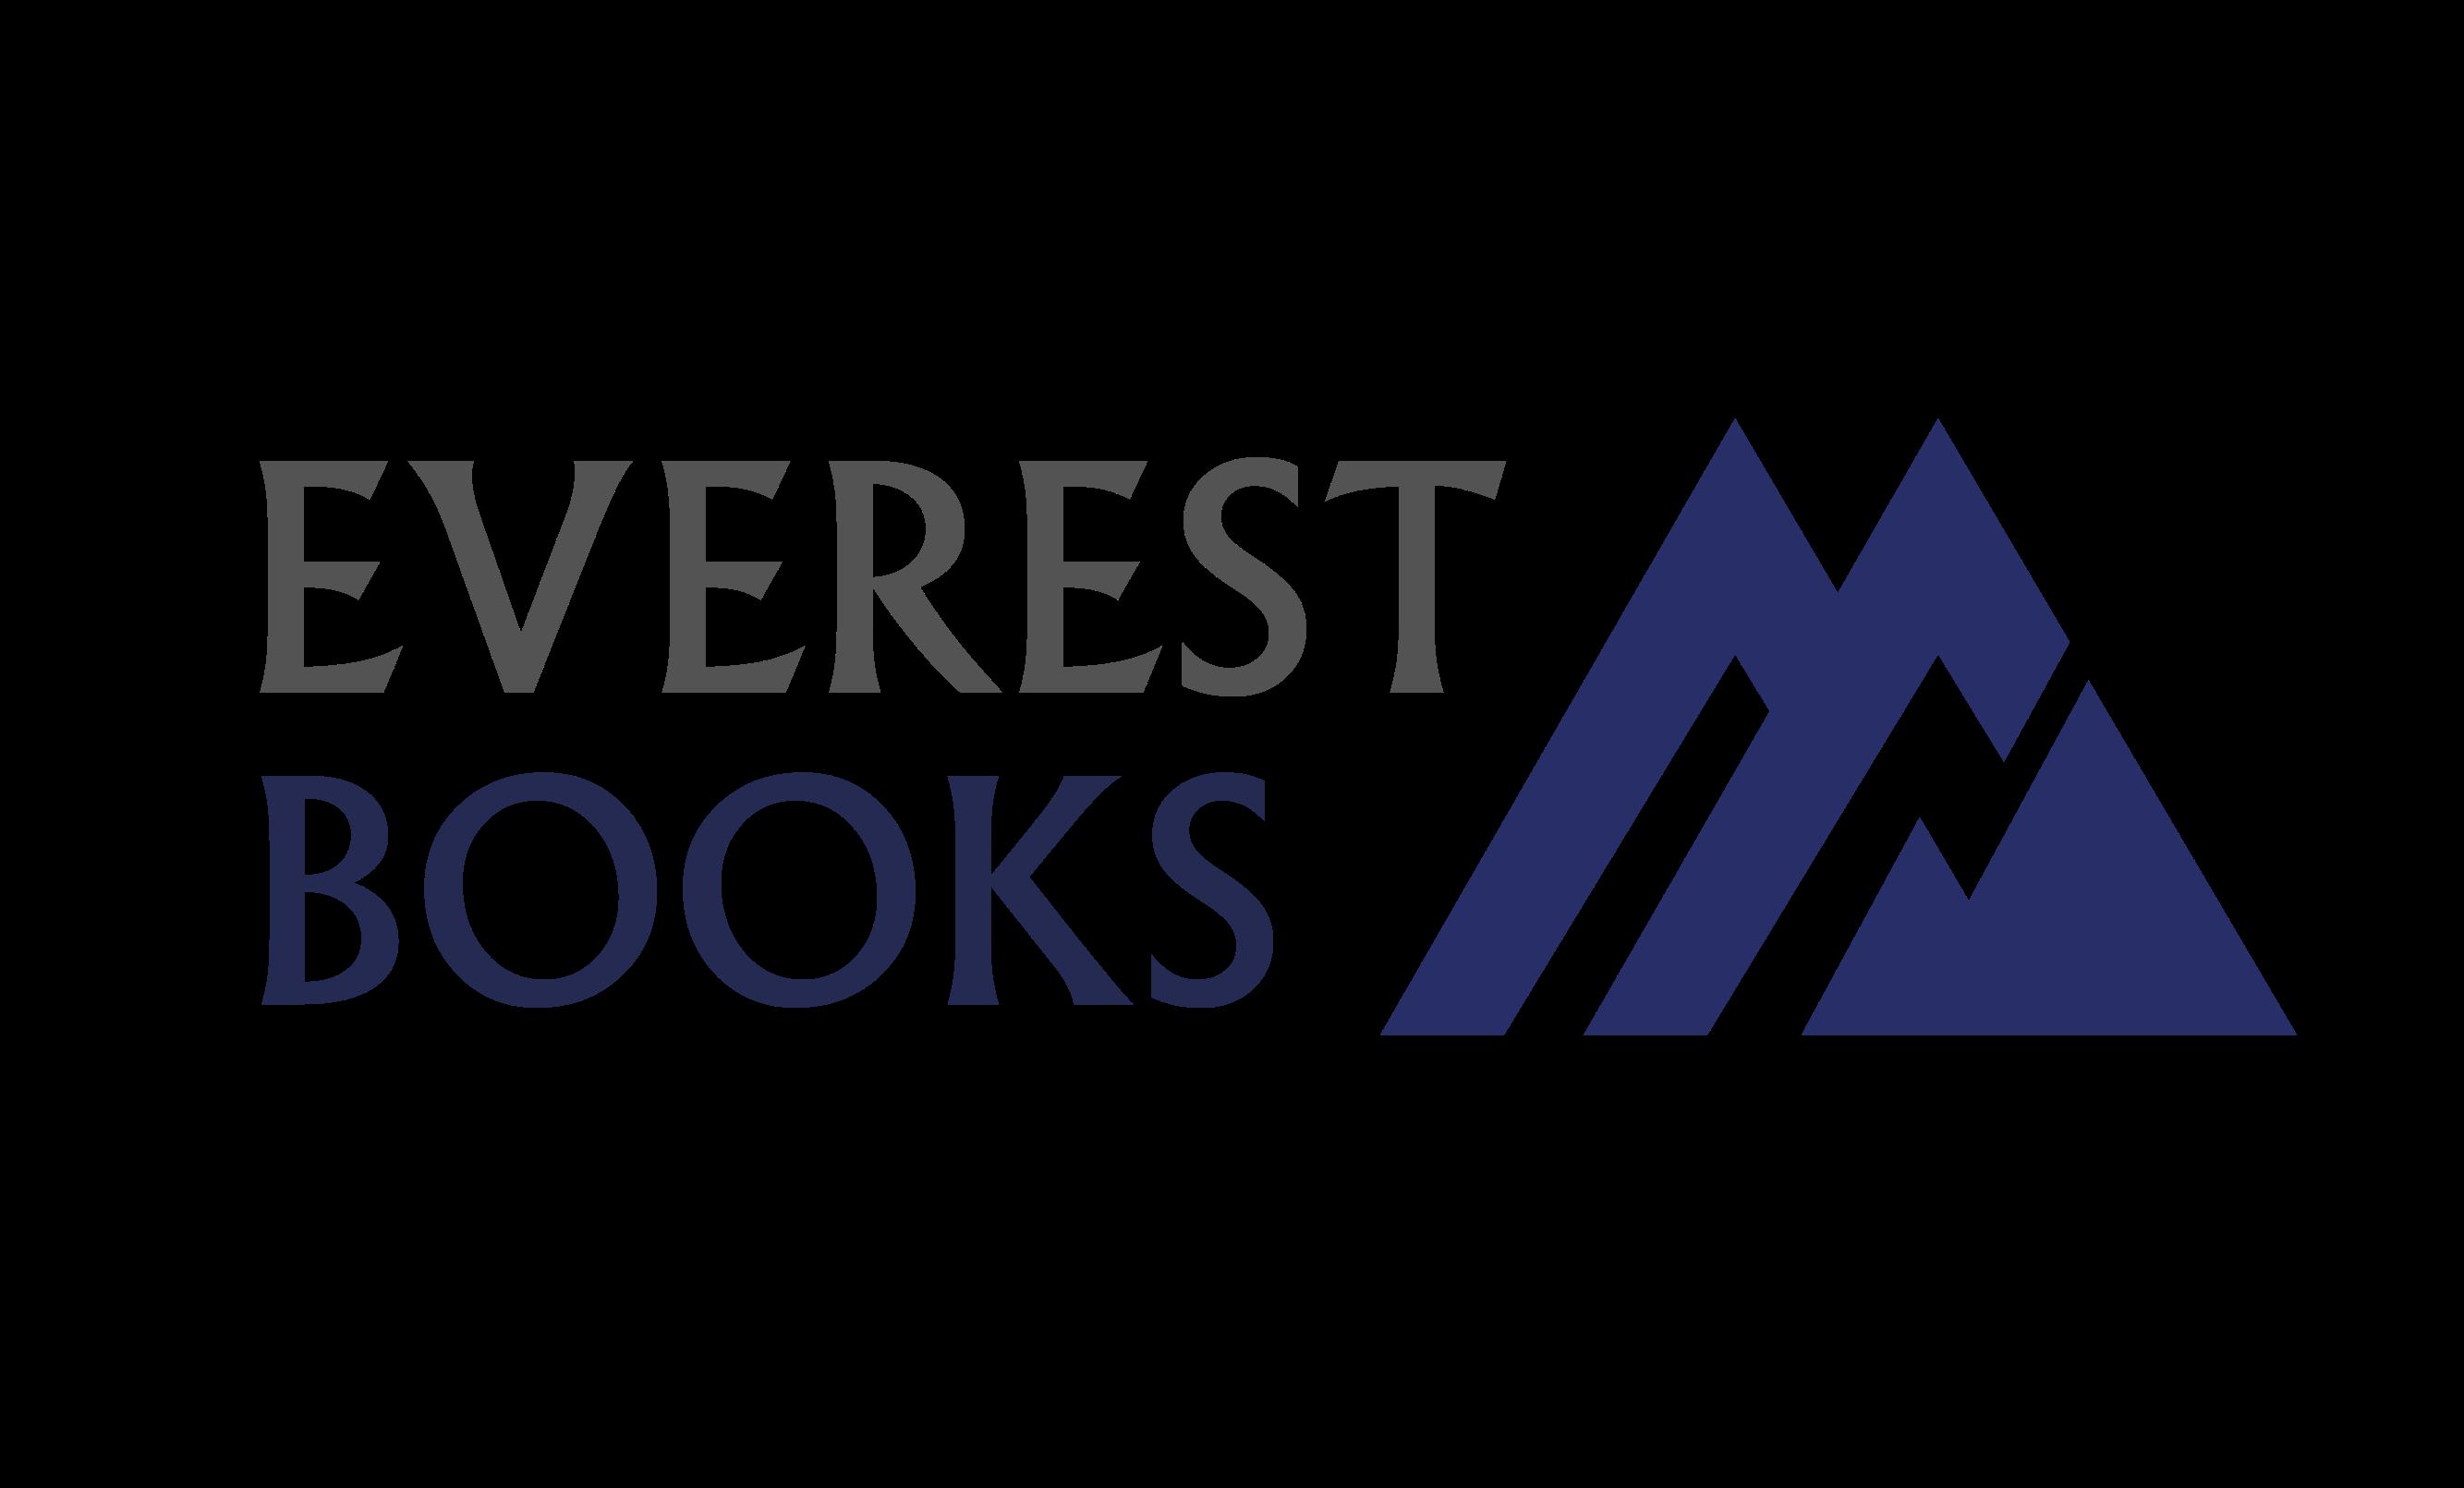 Everest Books Online Bookstore